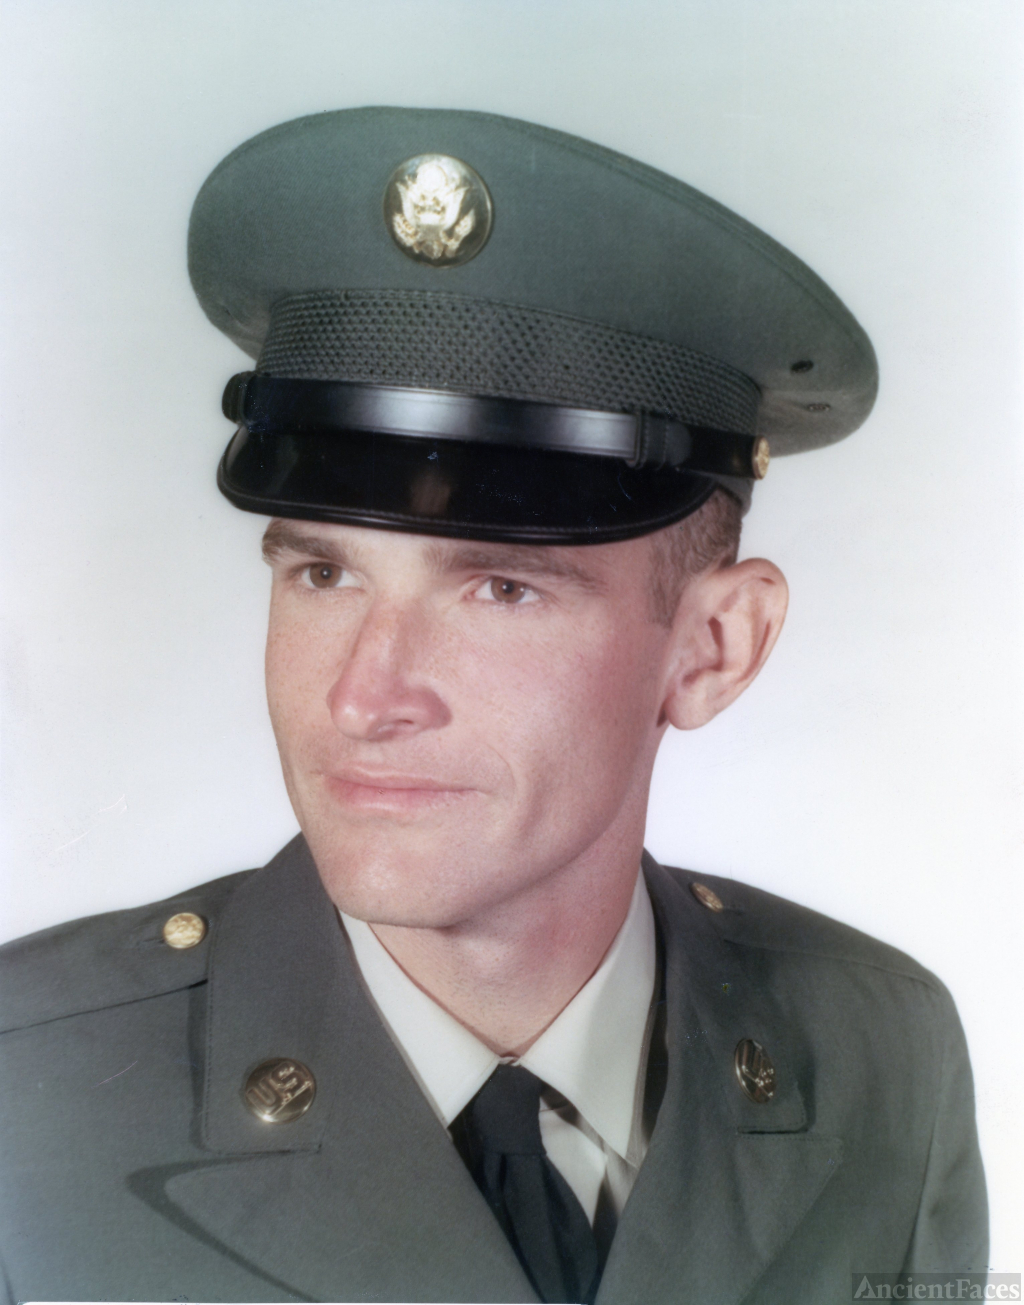 James J. Lechtenberg, US Army